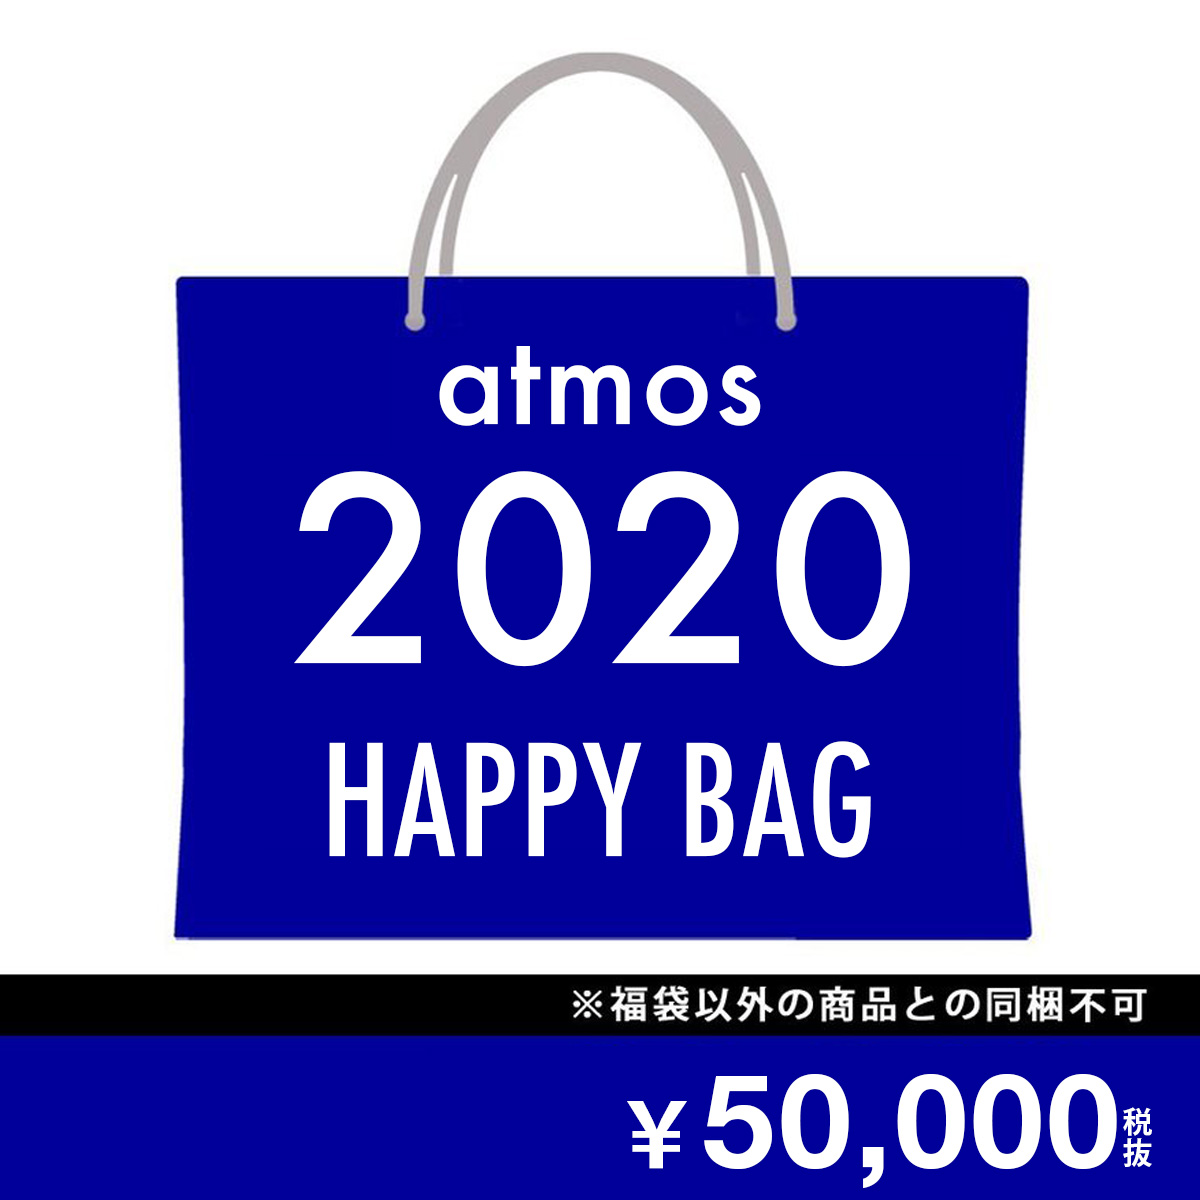 atmos 【2020年福袋】 HAPPY BAG 五万円 (MENS)アトモス 2020 フクブクロ 五万円 メンズ【メンズ 福袋】20SP-S